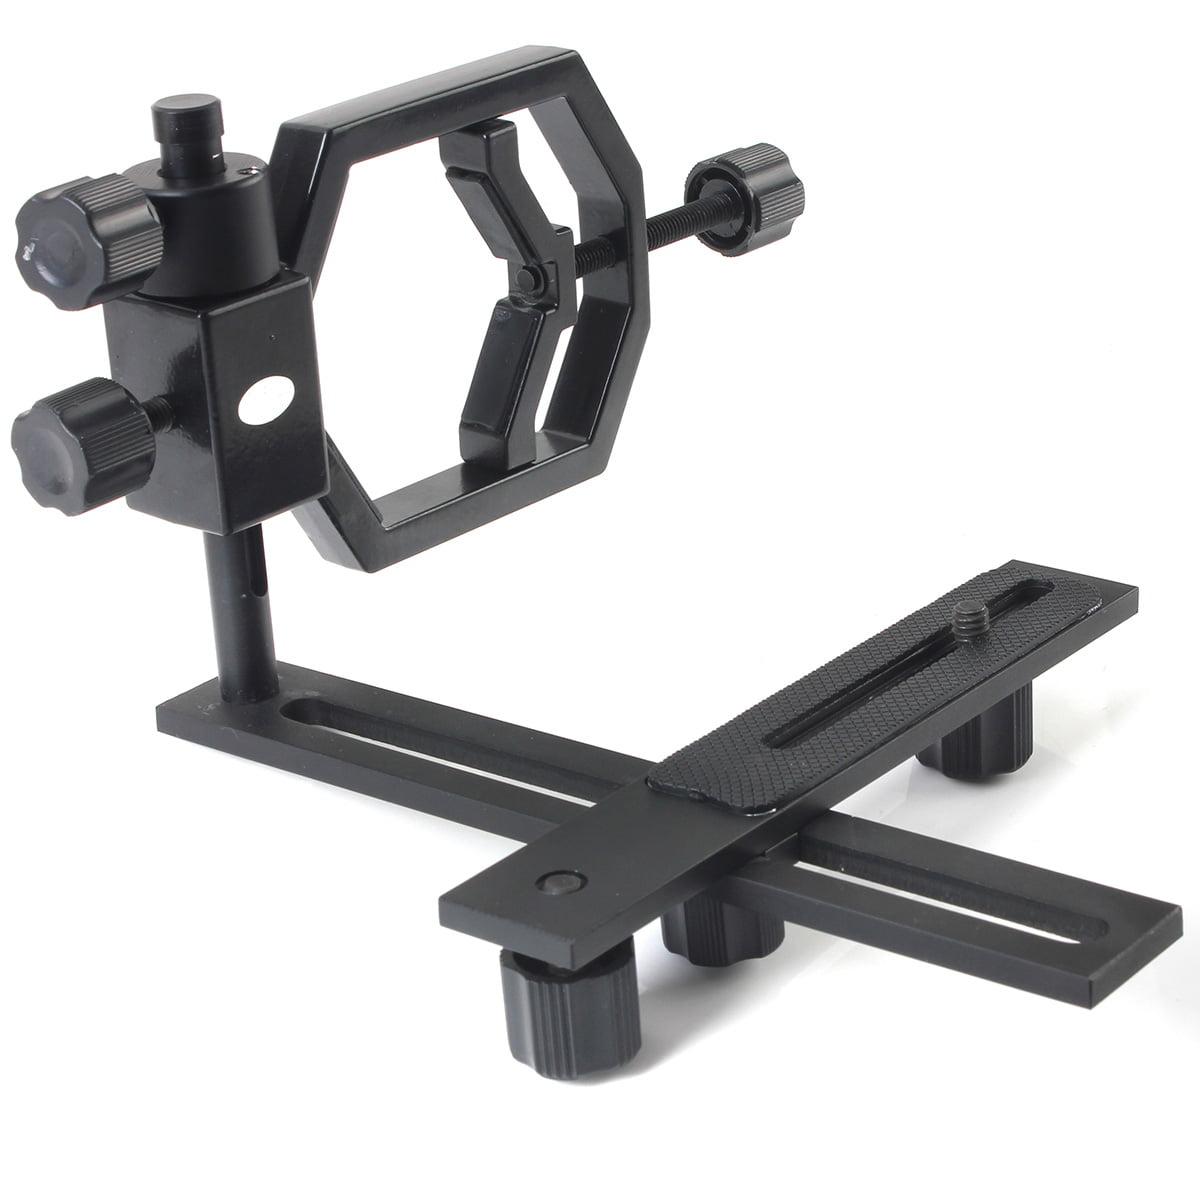 Universal Stand Metal Spotting camerasampphoto Scopes Telescope Mounts For Digital Camera,Black